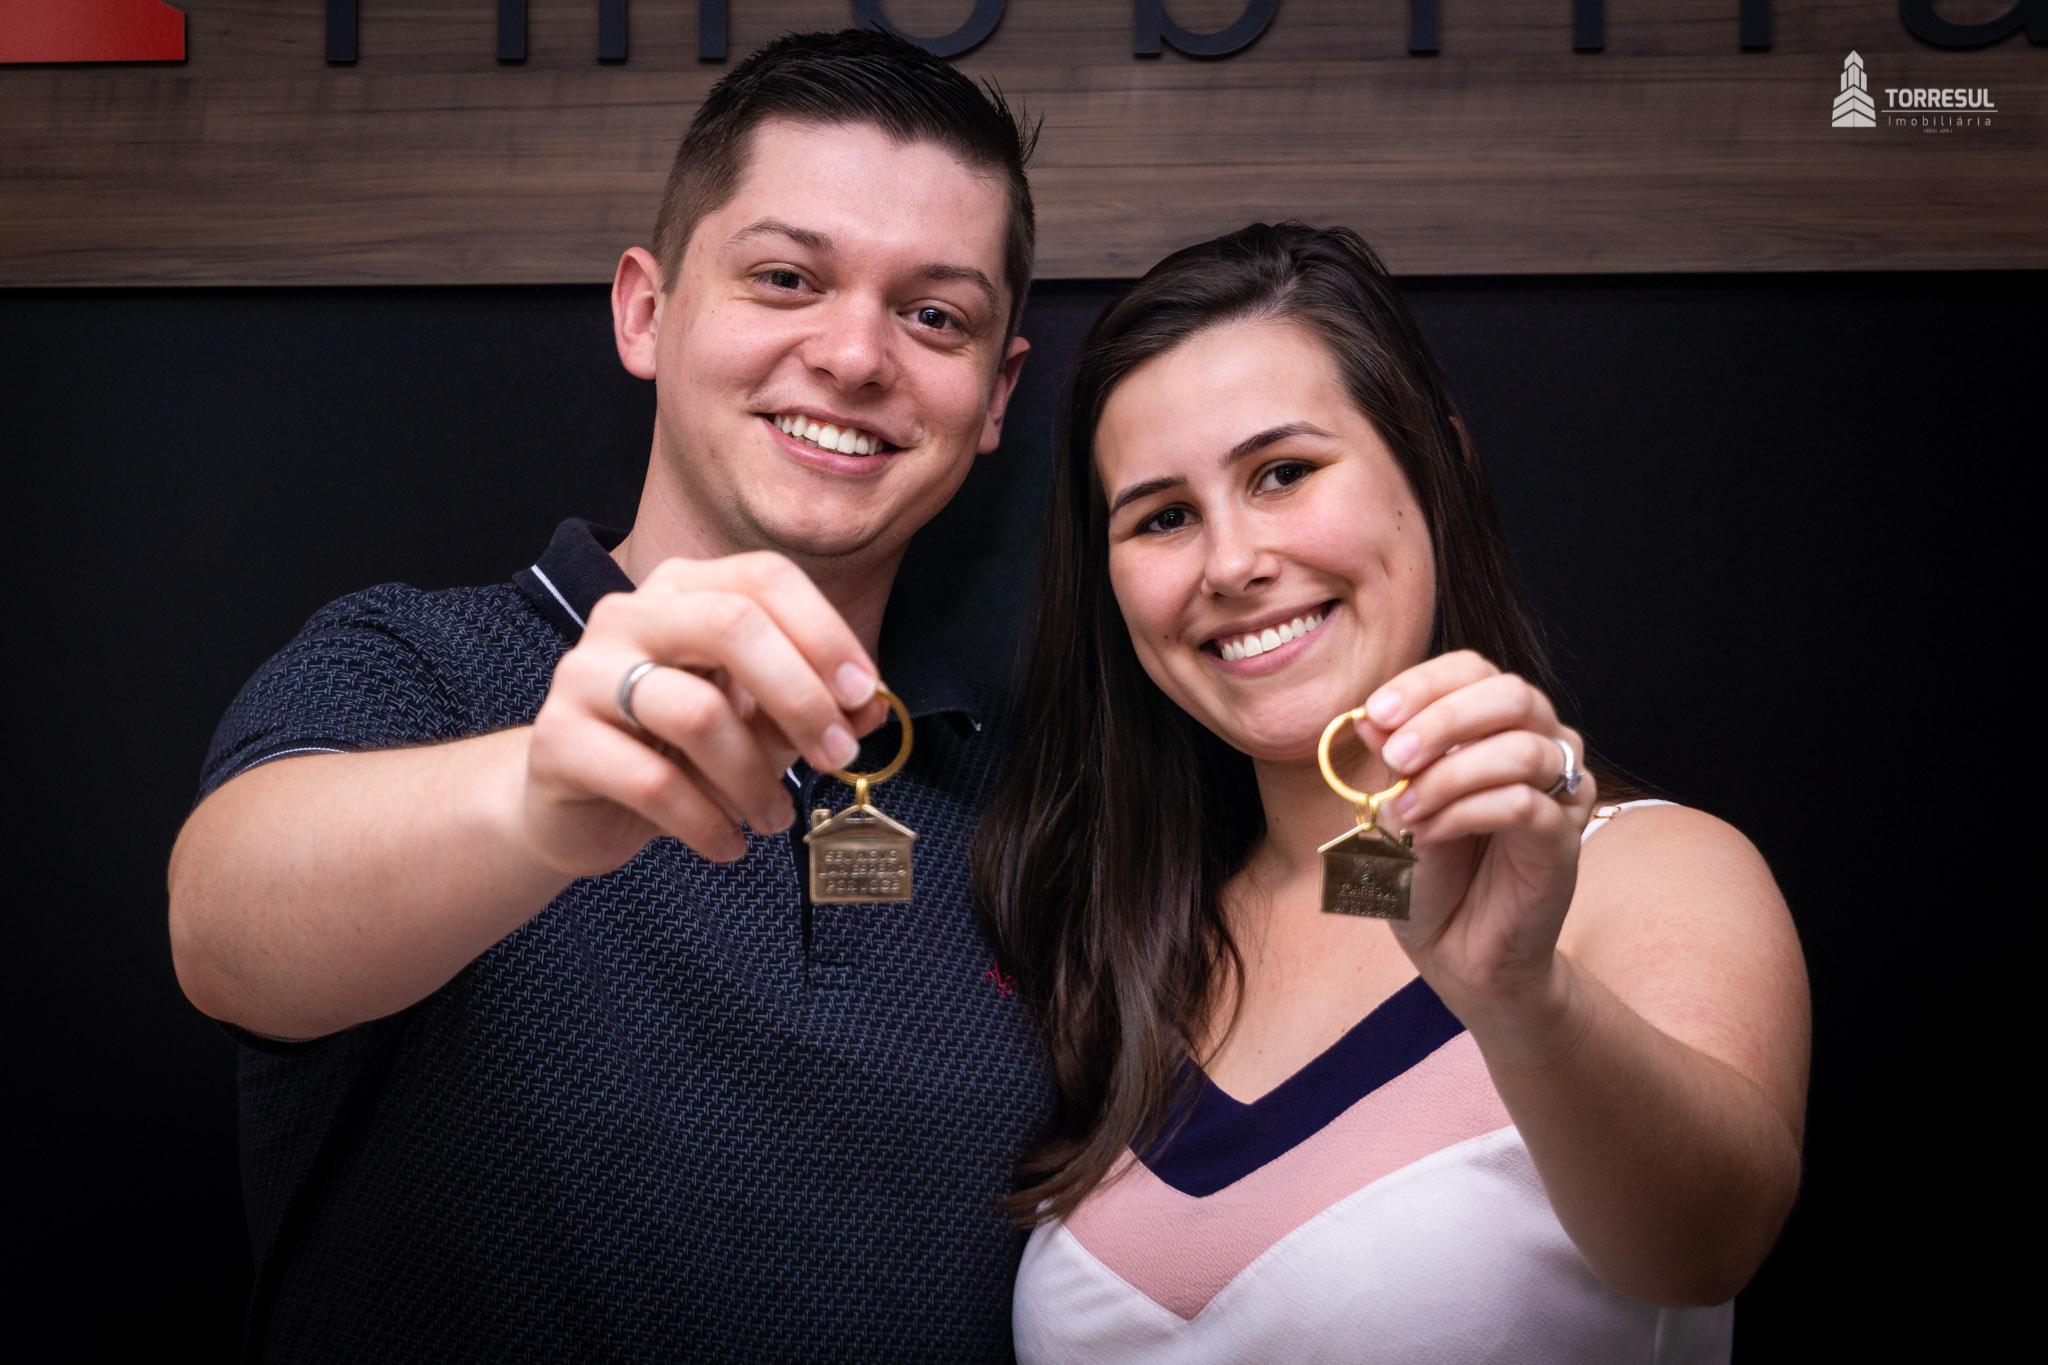 Casal na Torresul com a chaves da casa propria